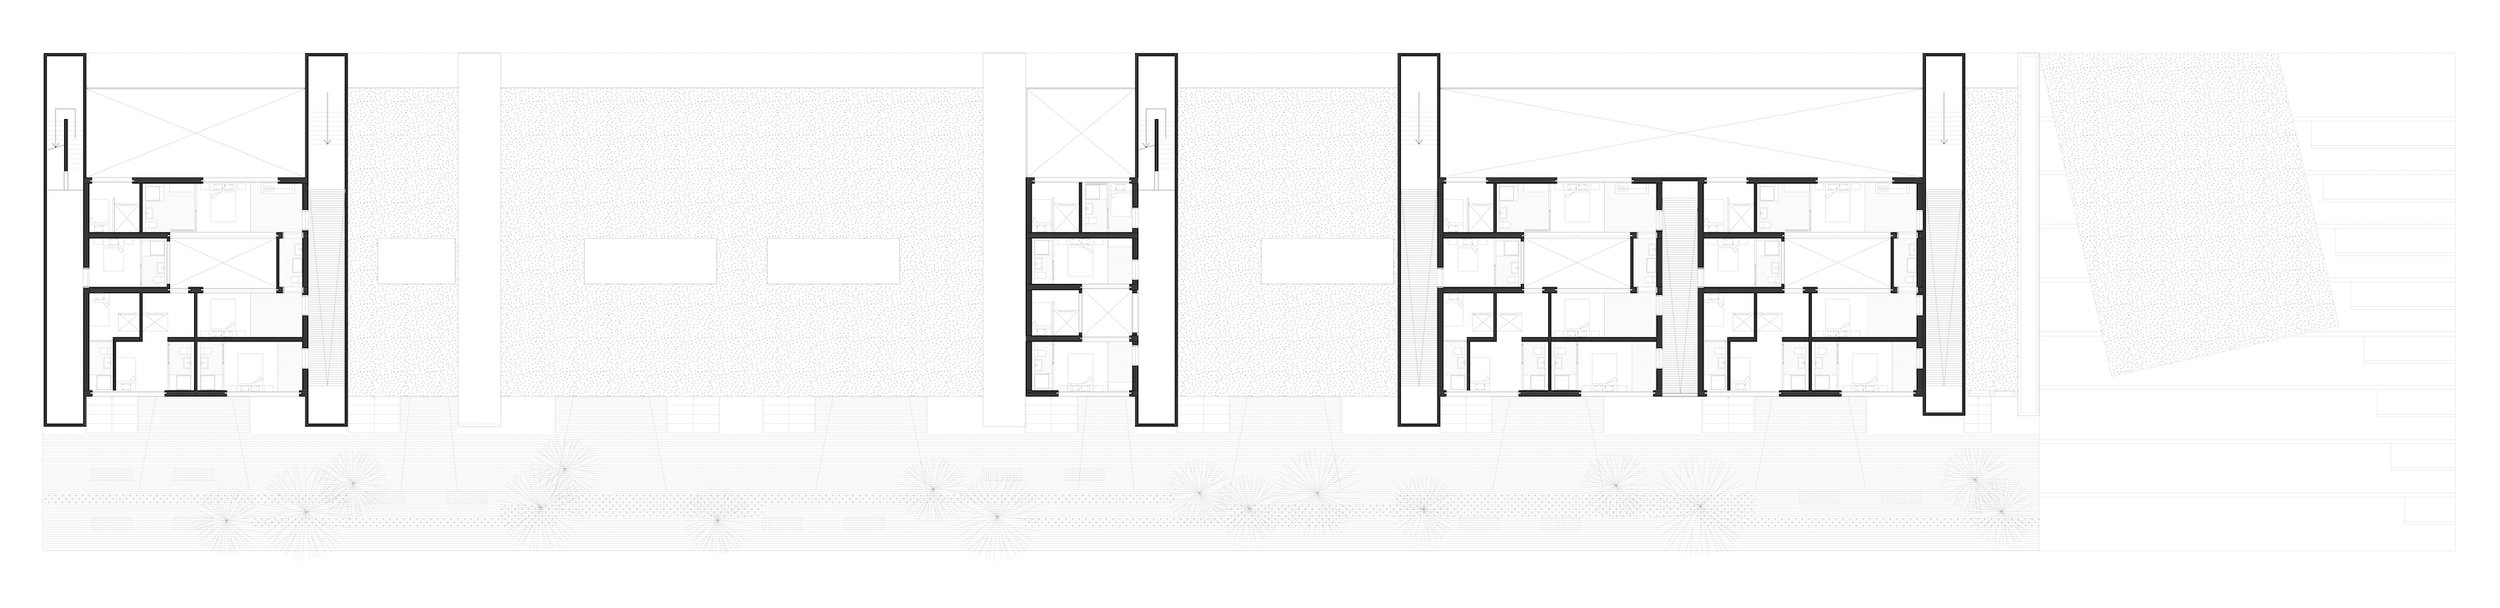 180419W13_Plan_Cluster3 [Converted]-01.jpg